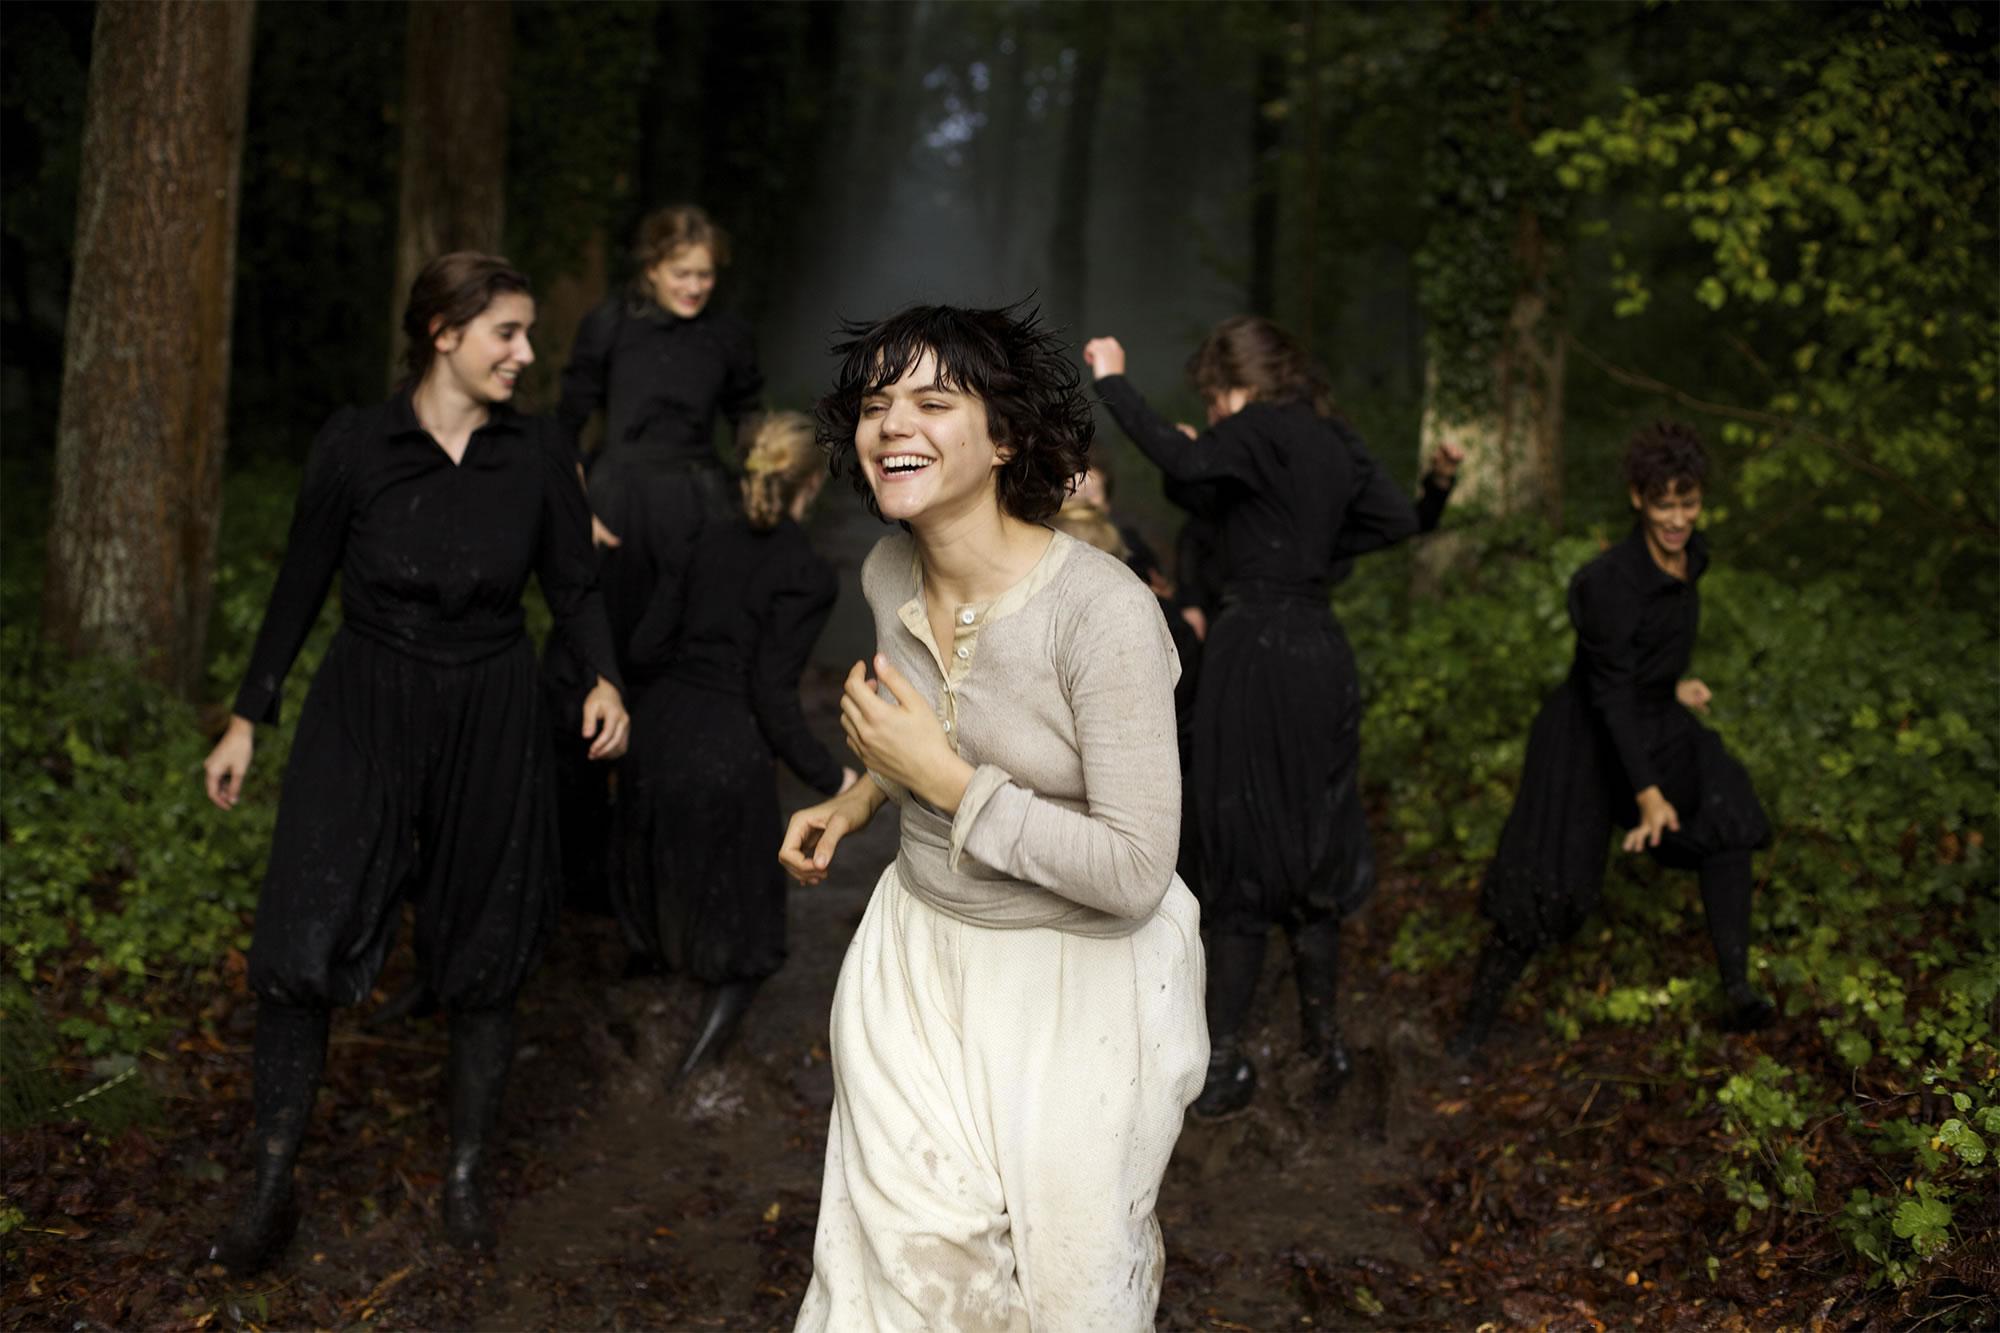 Stéphanie Sokolinski in The Dancer movie 2016